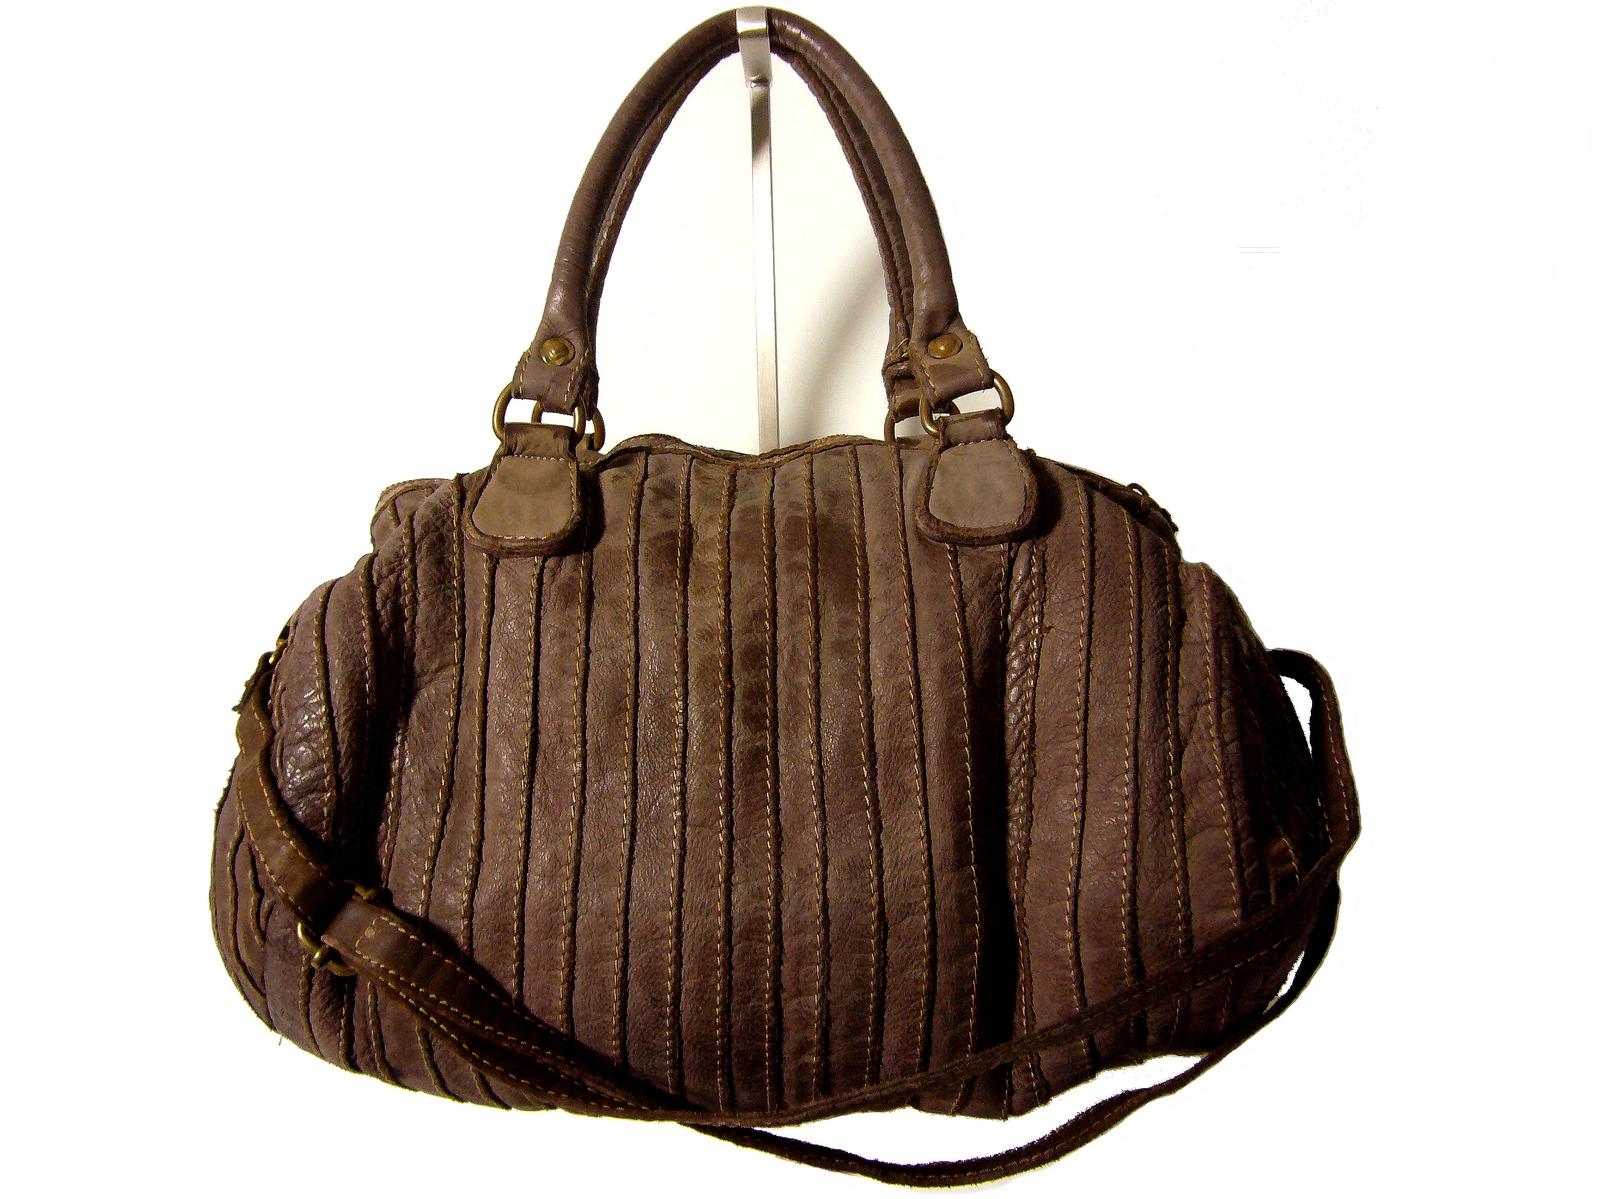 prix attractif beaucoup de styles magasin discount Sac épaule cuir vintage taupe Paolo